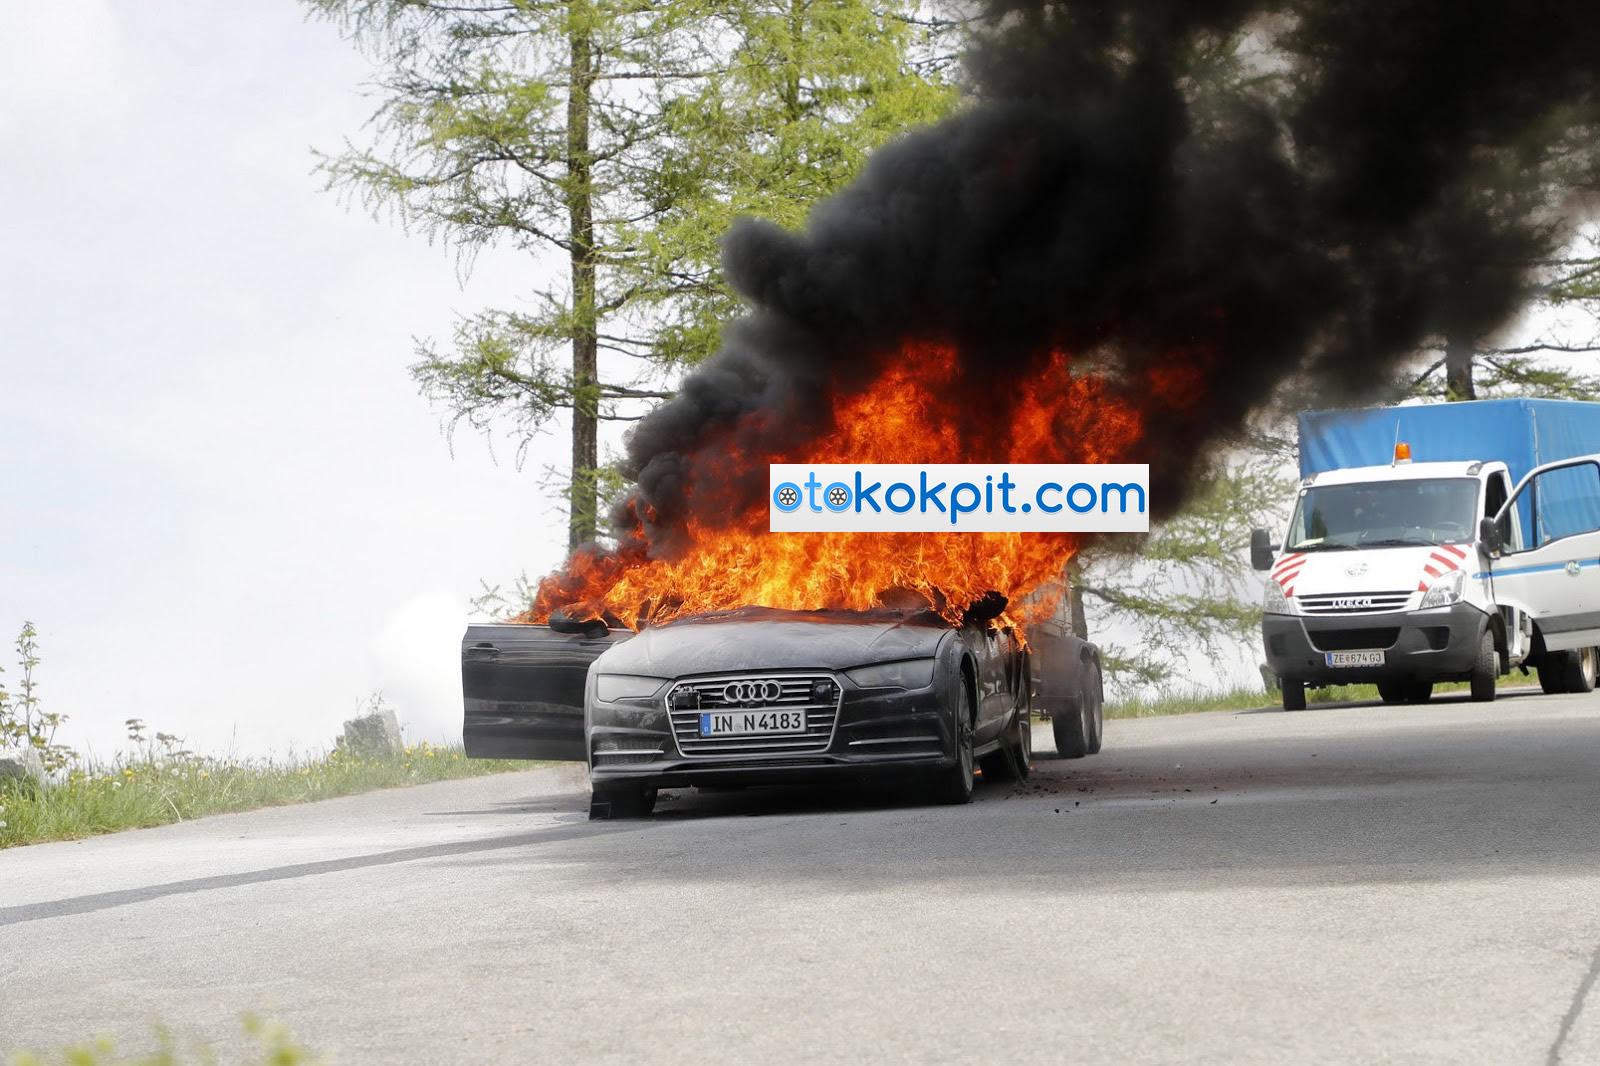 2019 Yeni Kasa Audi A7 Yandı